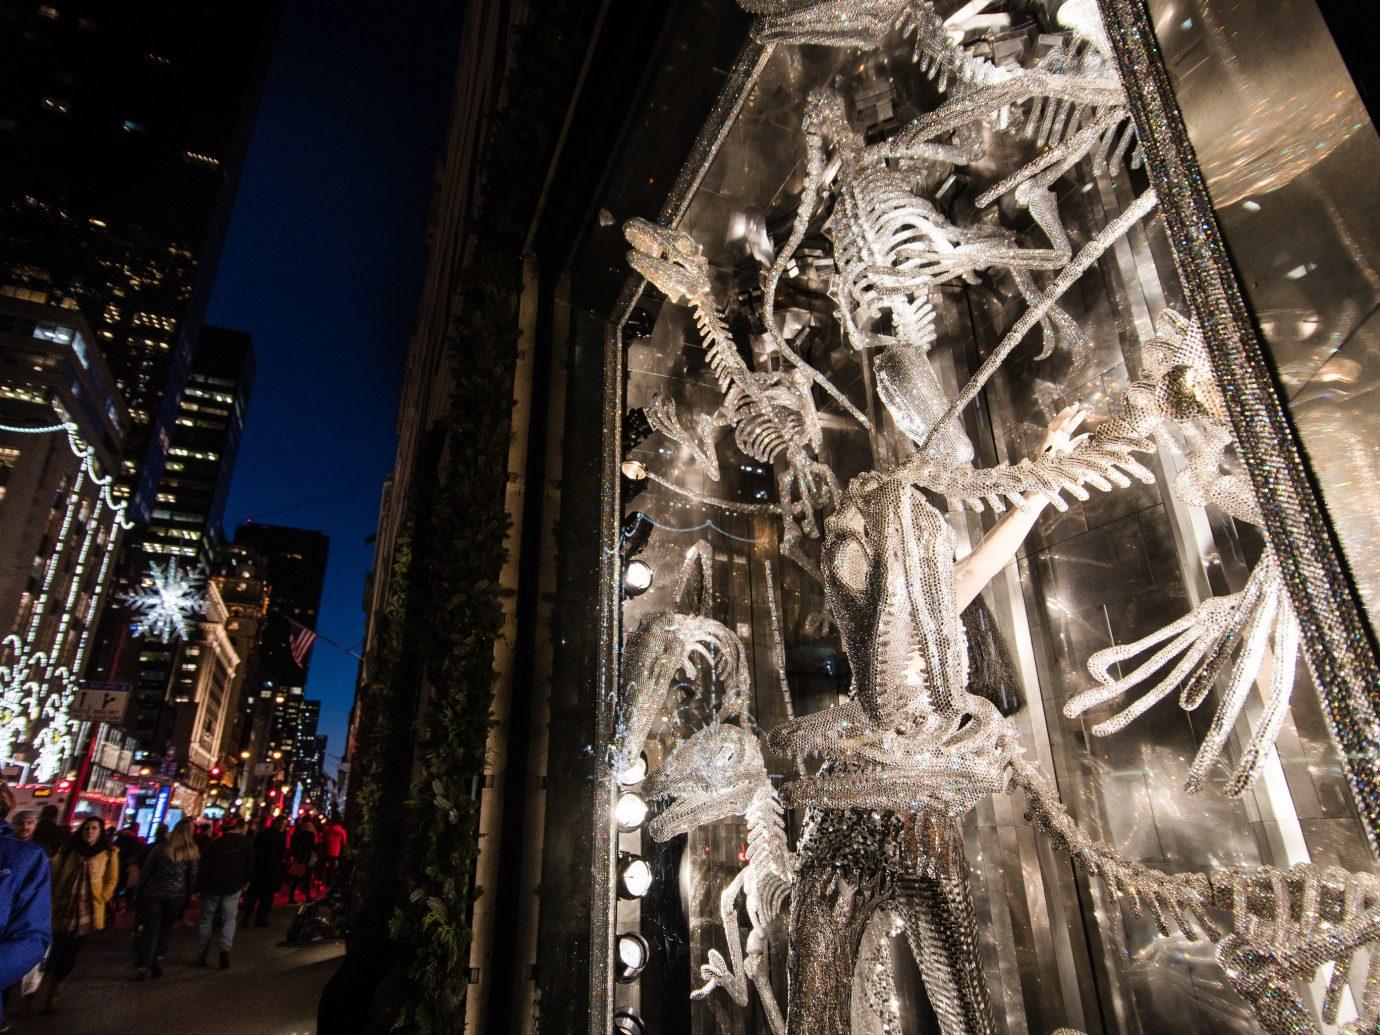 Offbeat Winter landmark urban area metropolis City night tourist attraction building street altar